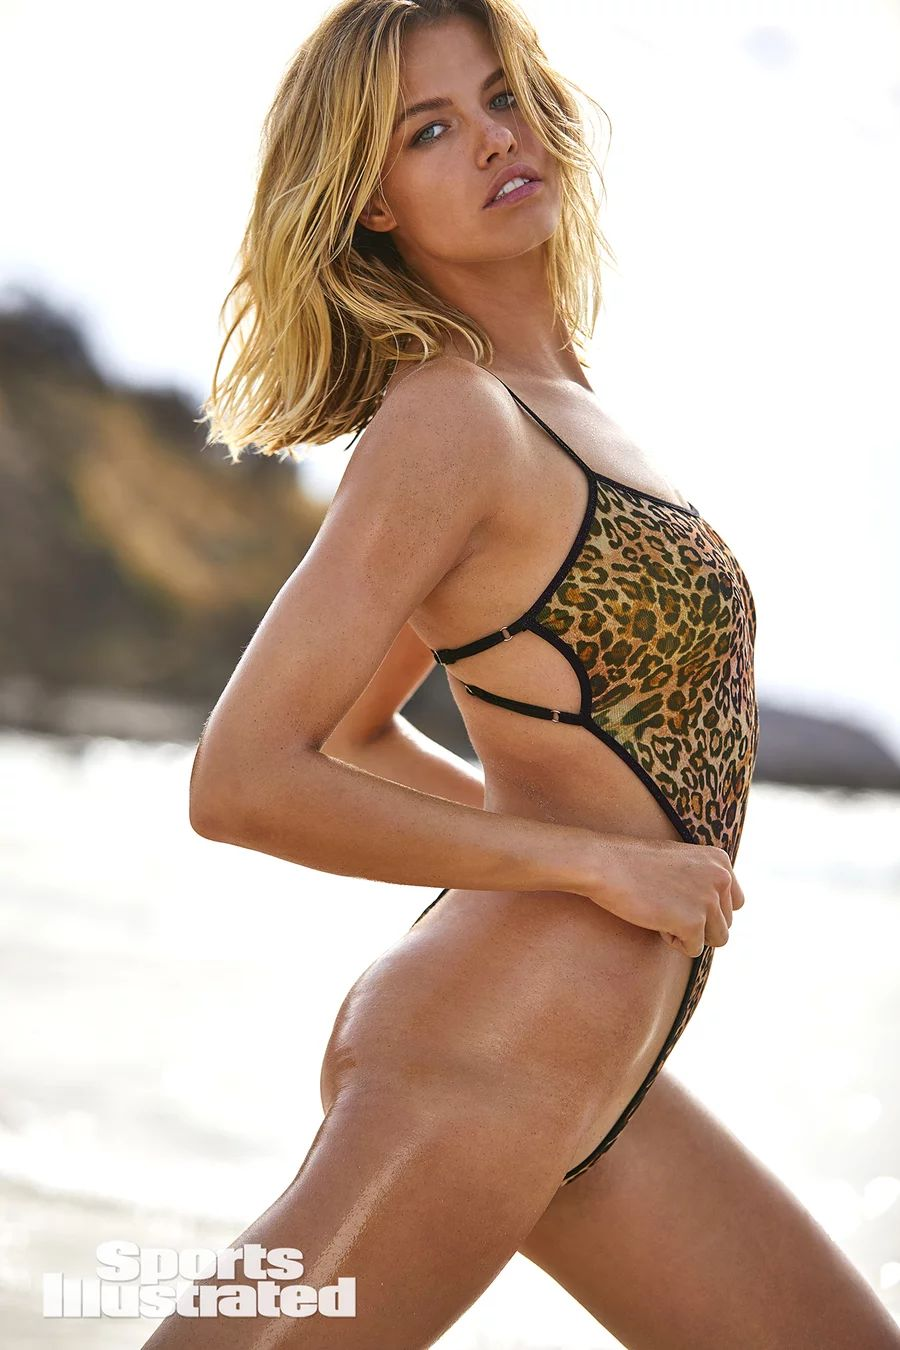 0409070957118_21_Hailey-Clauson-Sexy-Nude-TheFappeningBlog.com-22.jpg